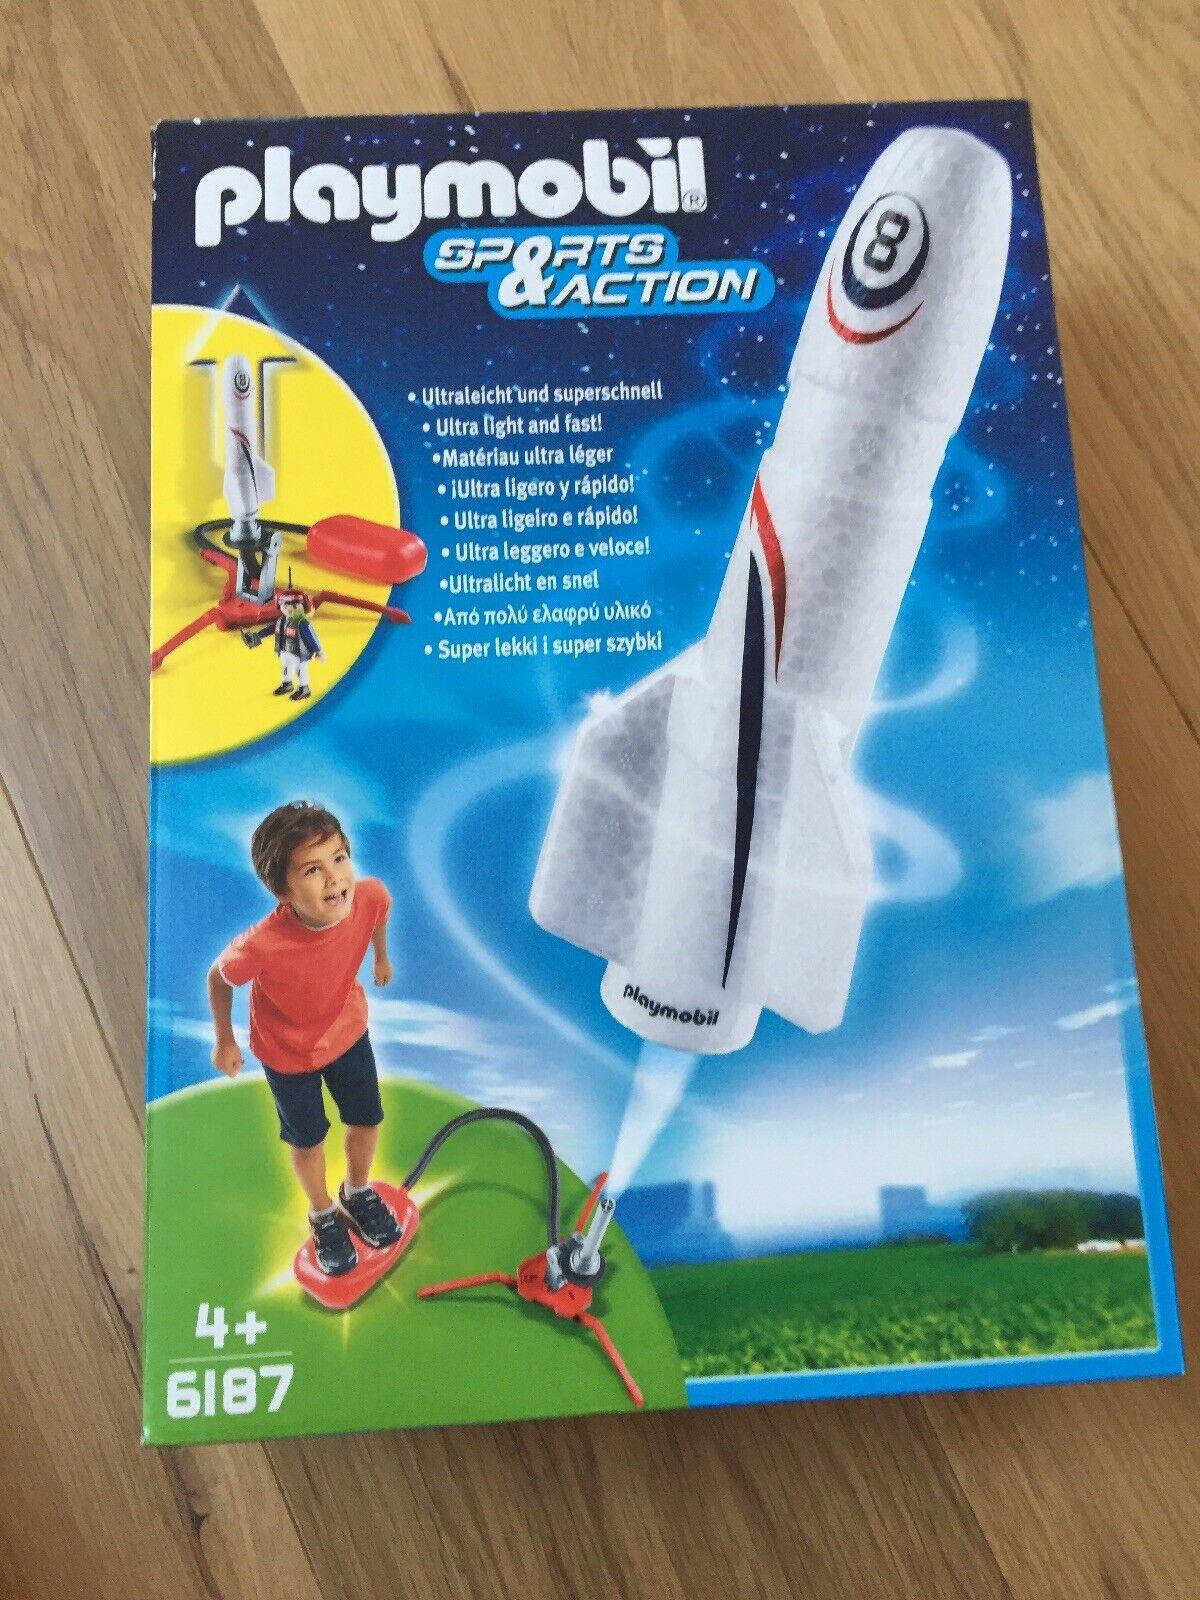 Playmobil 6187 Kinder Spielzeug Rakete + Booster, Neu U OVP